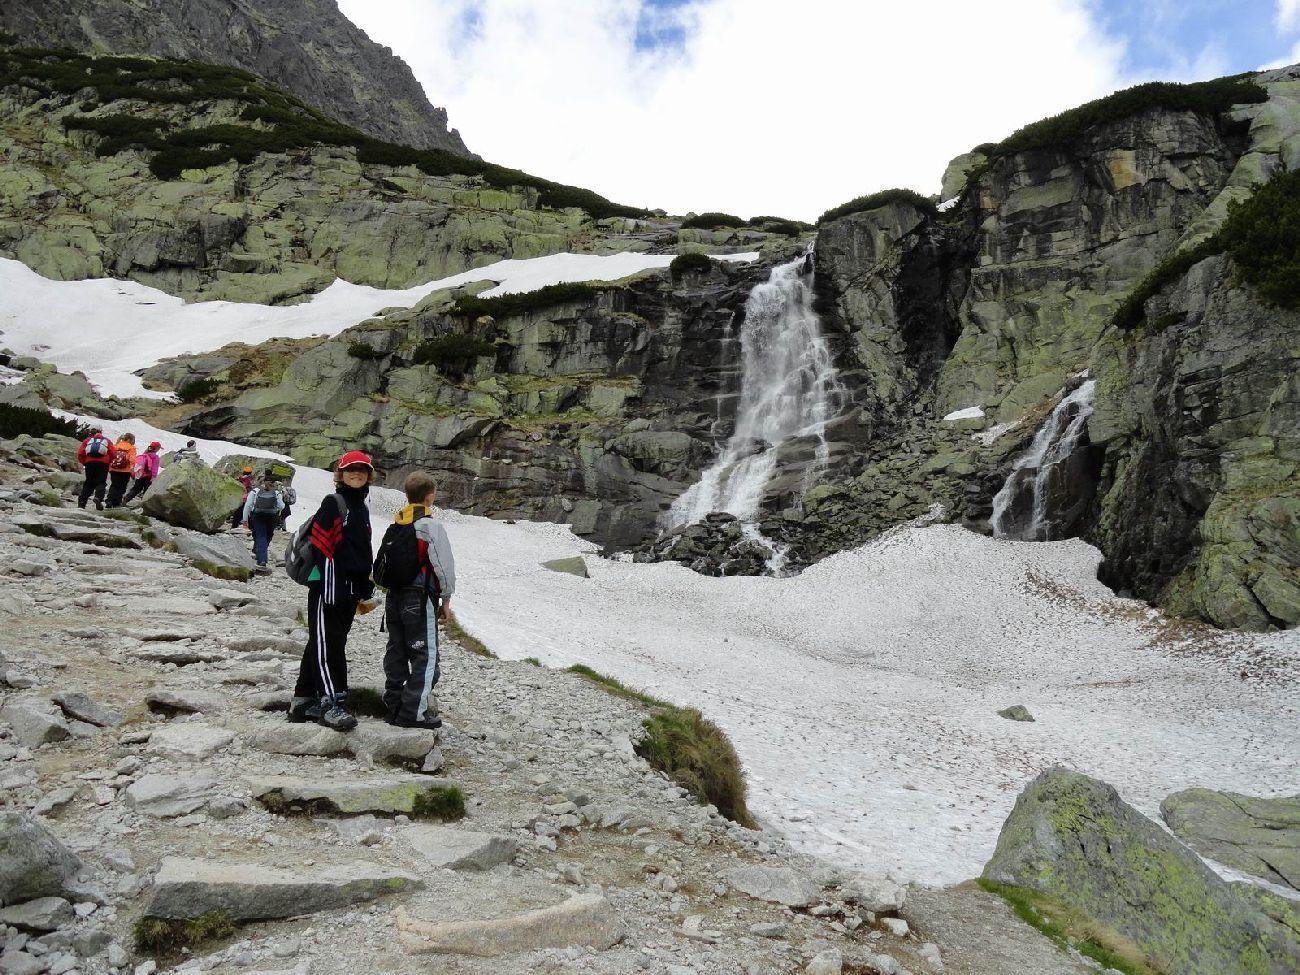 TRAVEL BROADENS THE MIND: Slovakia - High Tatras - Waterfall Skok